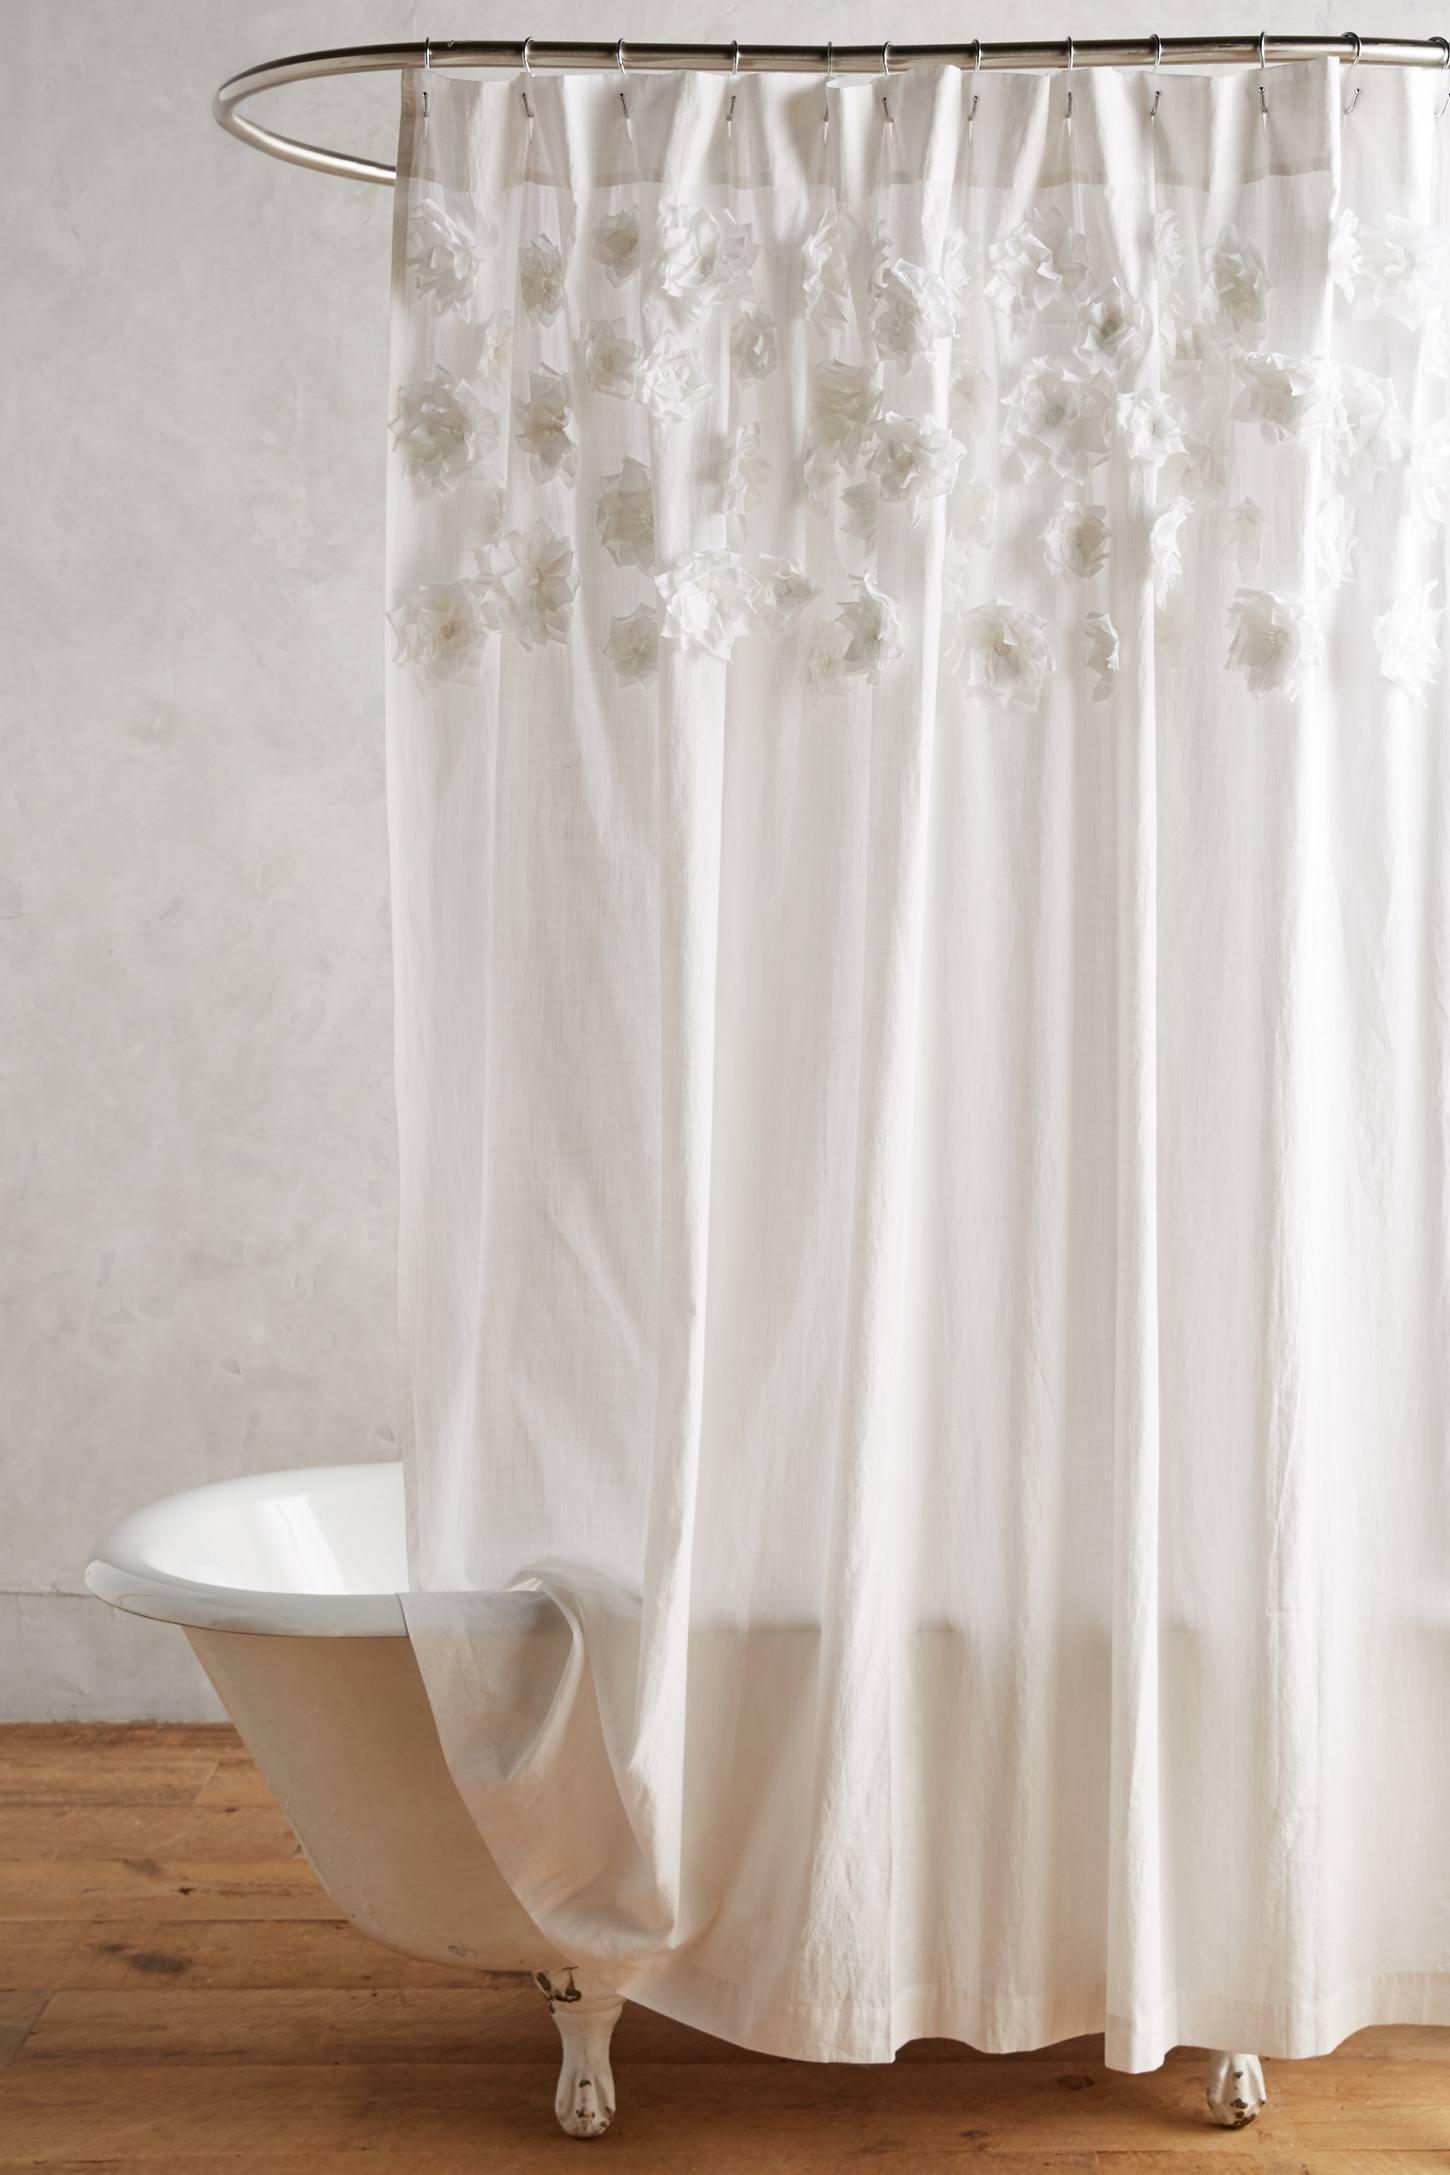 Anthropologie tender falls shower curtain - Georgina Shower Curtain